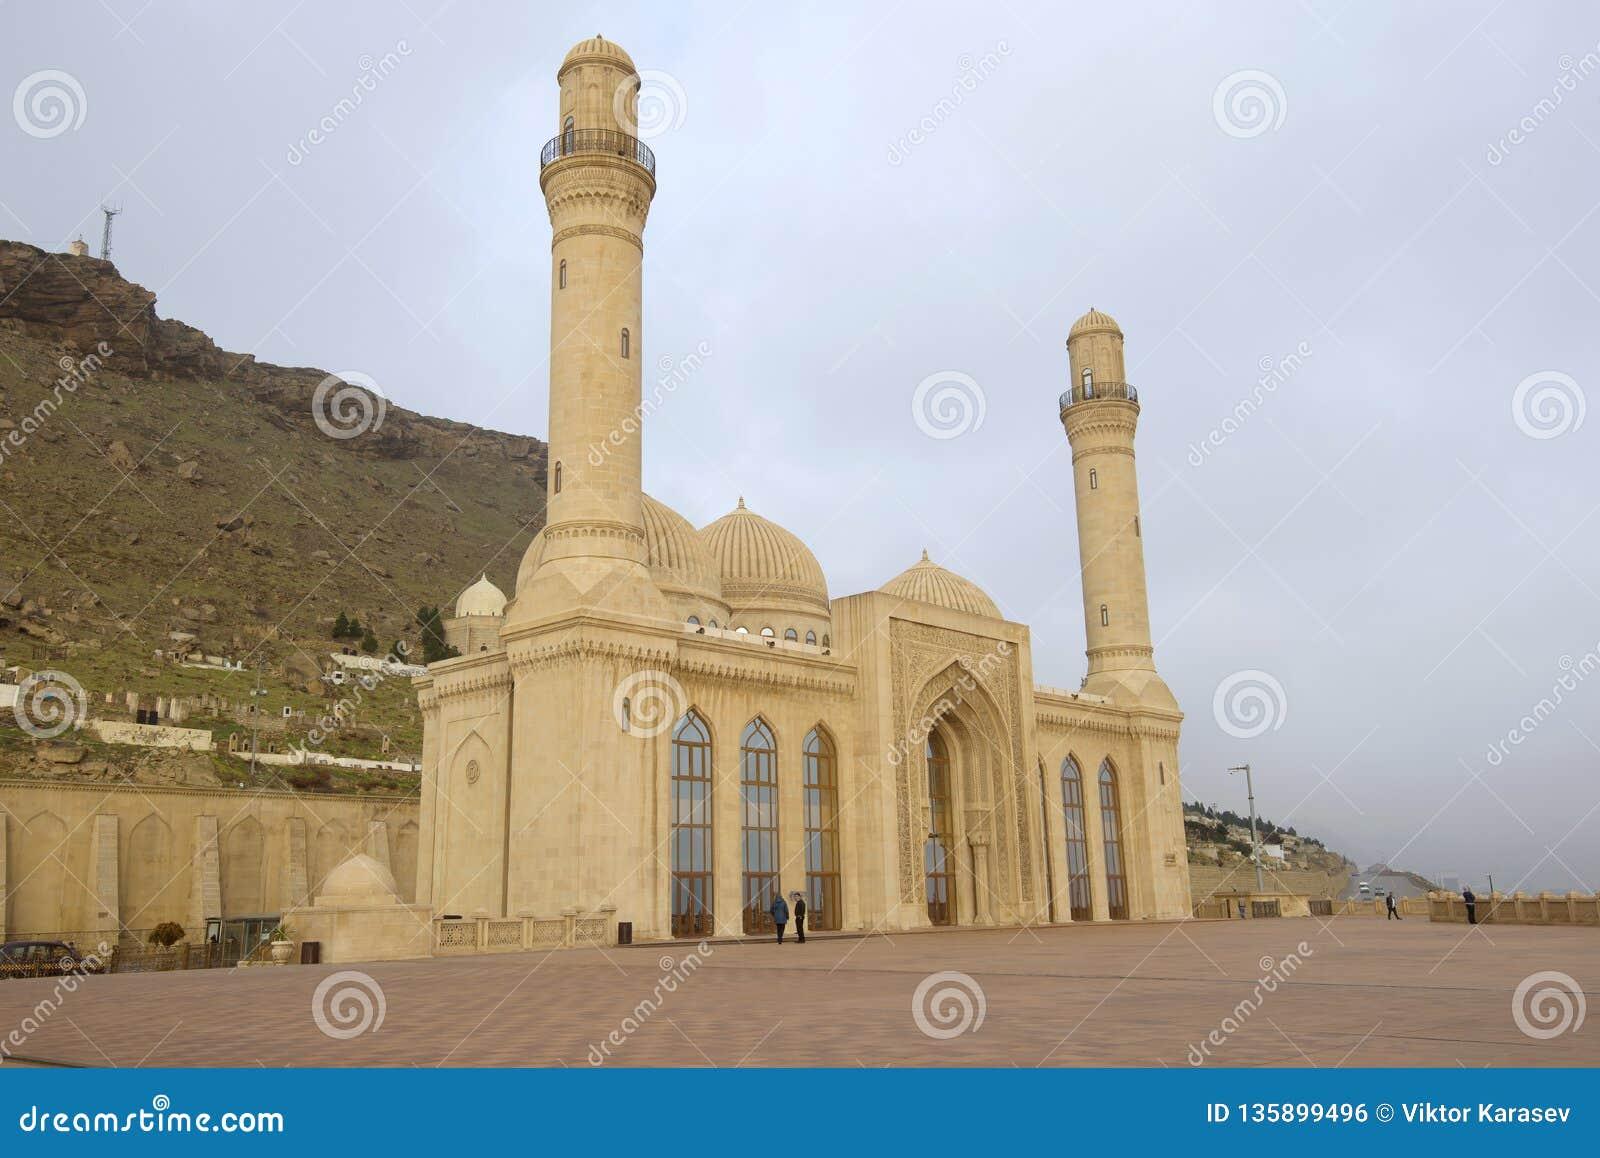 Moschea sciita ristabilita Bibi-Eybat, mattina di gennaio Bacu, Azerbaigian